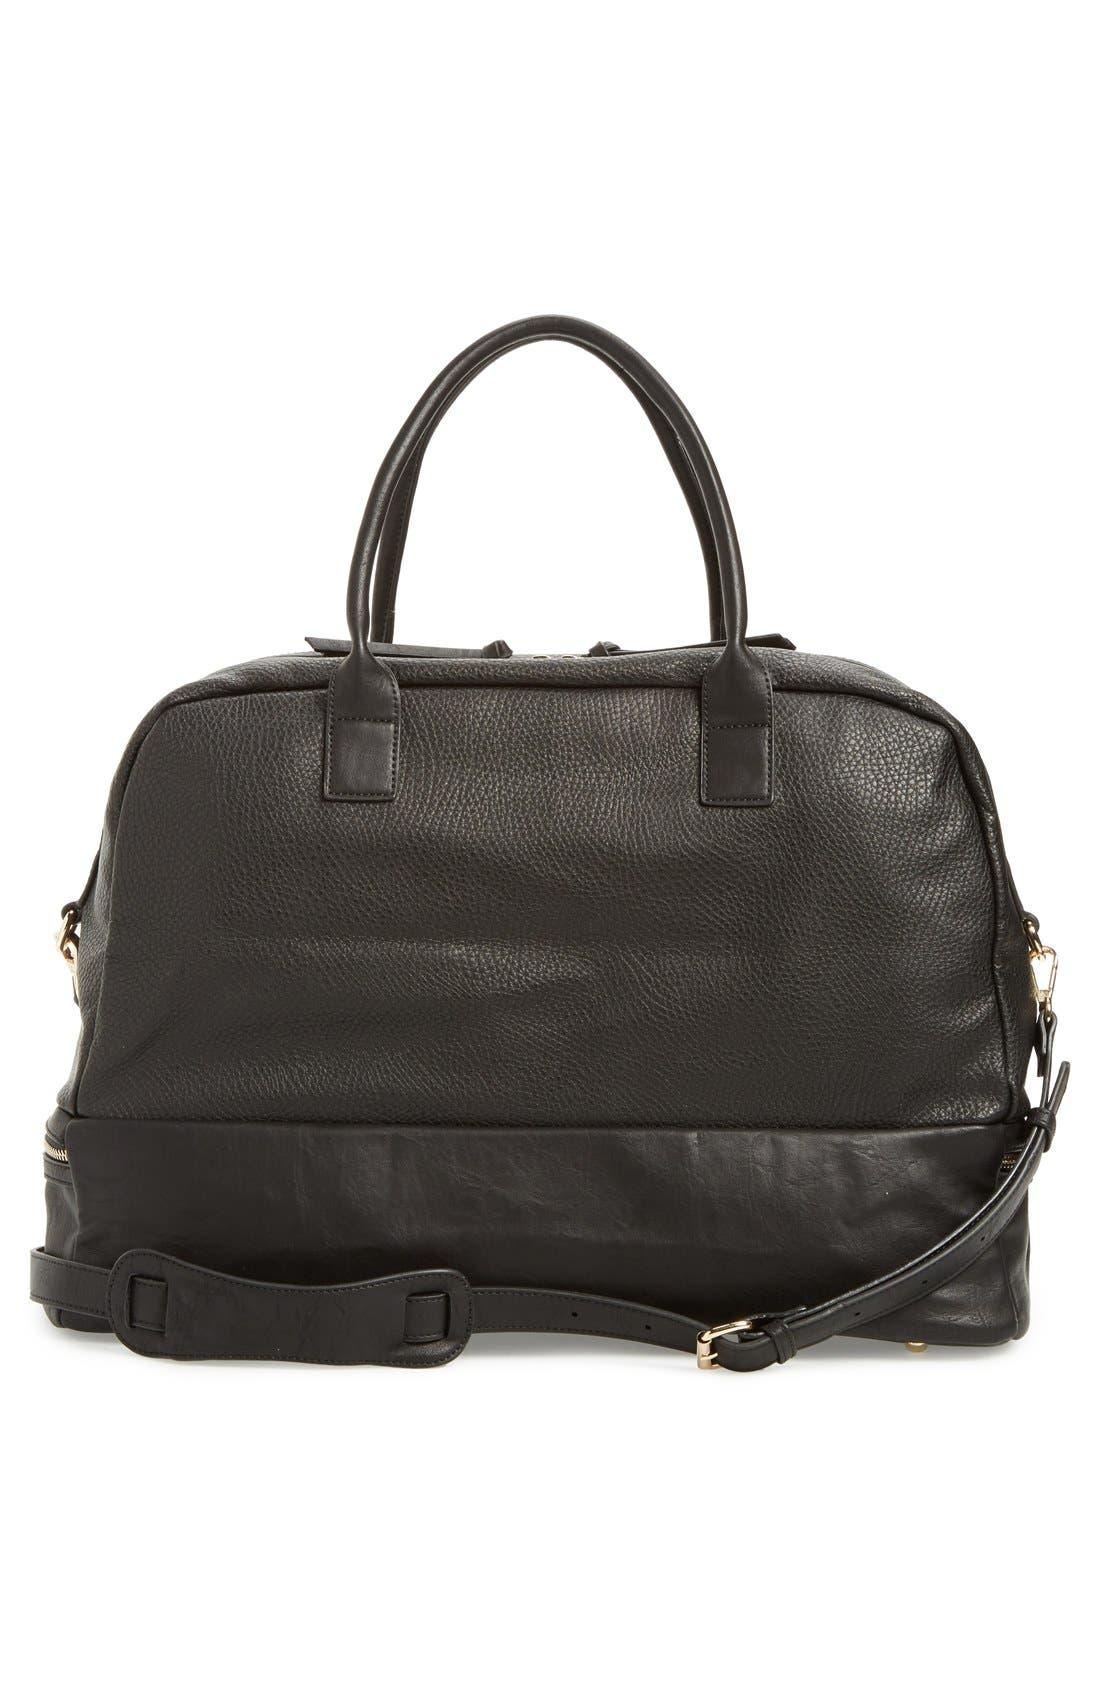 Mason Weekend Bag,                             Alternate thumbnail 3, color,                             Pebbled Black